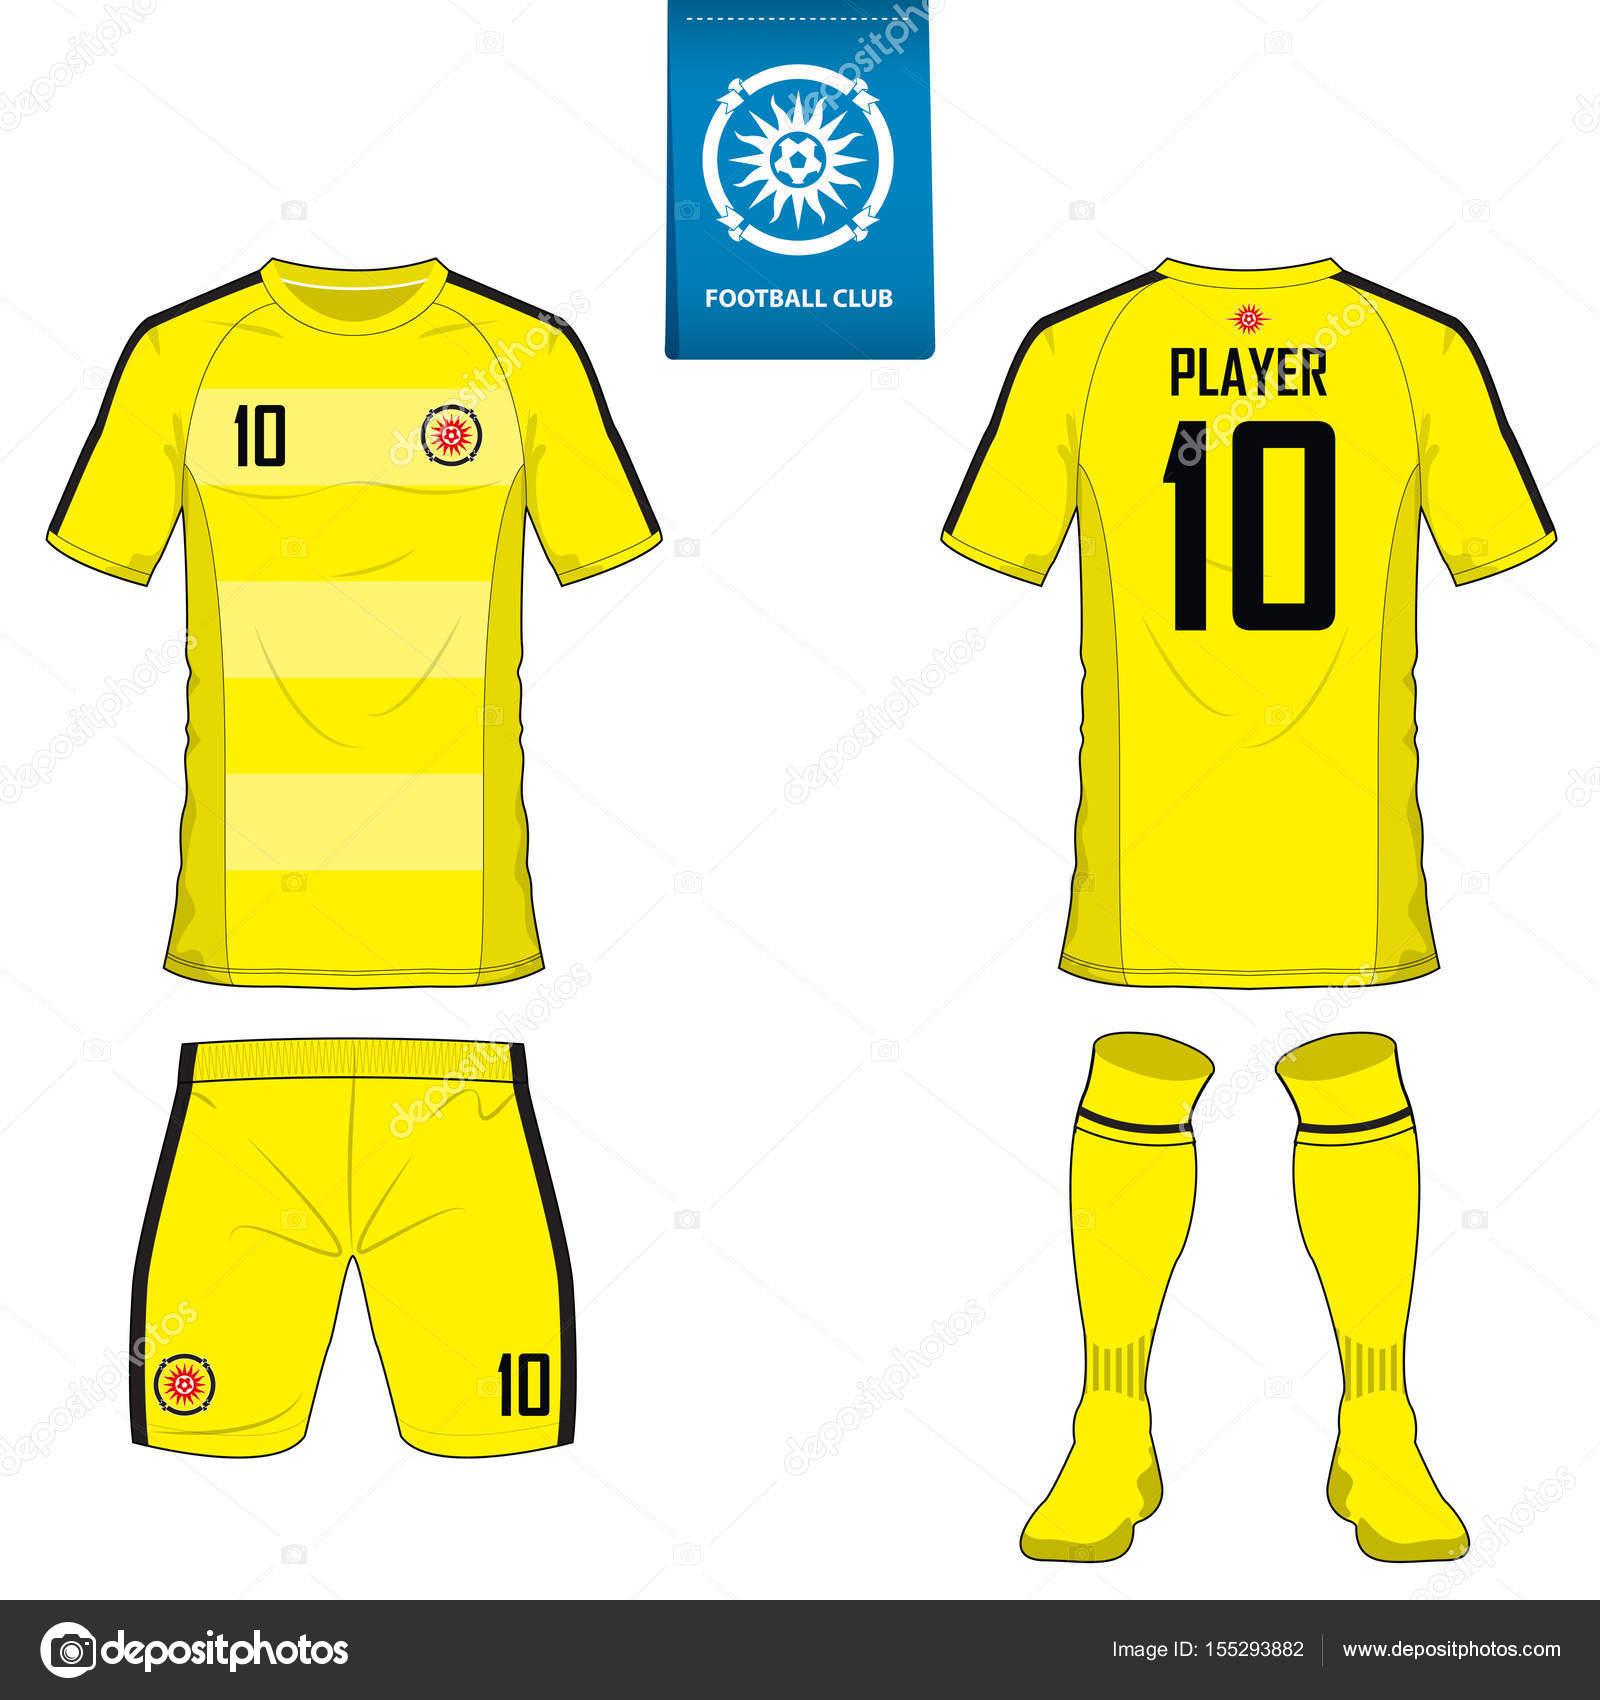 Conjunto de la plantilla de fútbol kit o del balompié de jersey para club  del balompié. Camiseta fútbol manga corta imitan para arriba. 602c14e654c3e